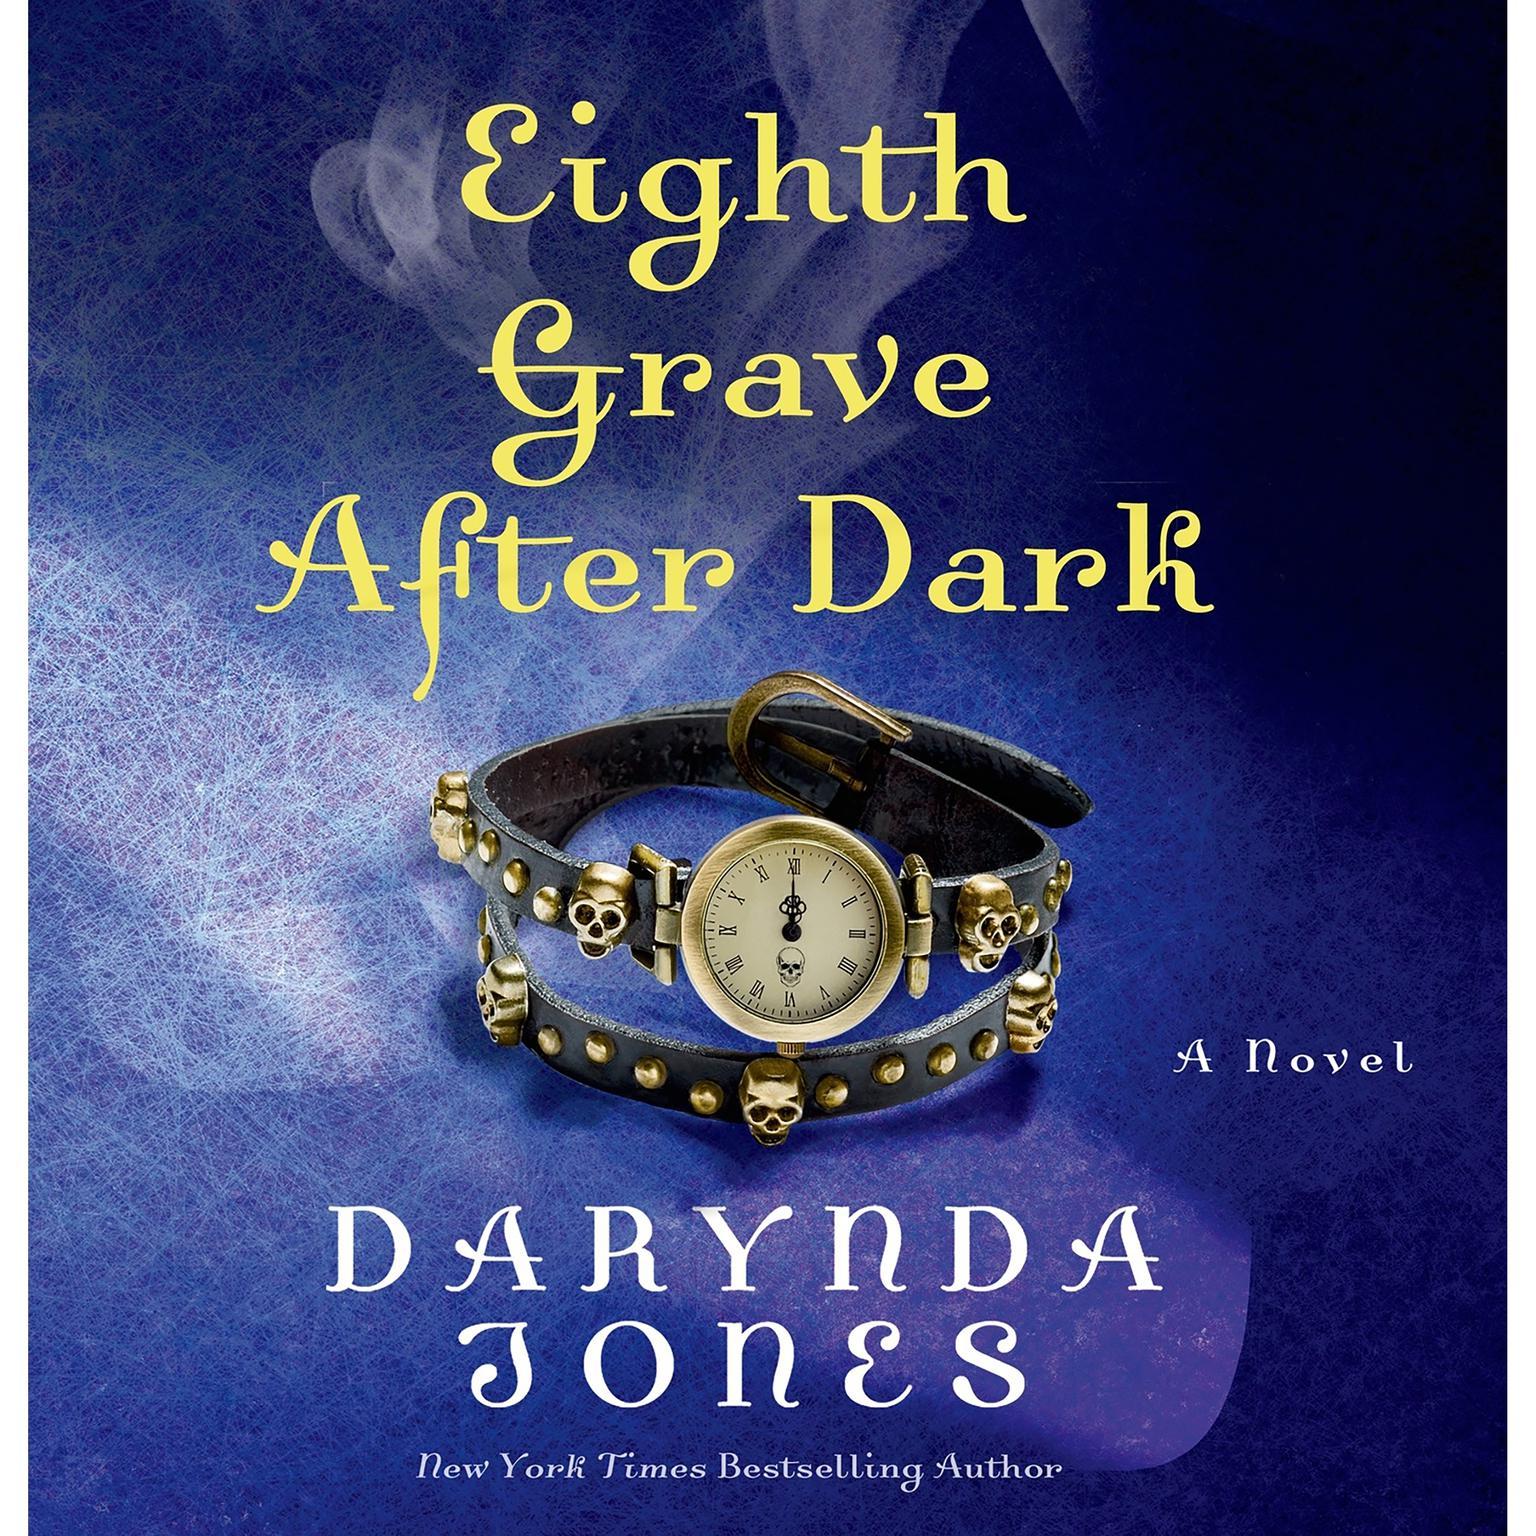 Eighth Grave After Dark: A Novel Audiobook, by Darynda Jones